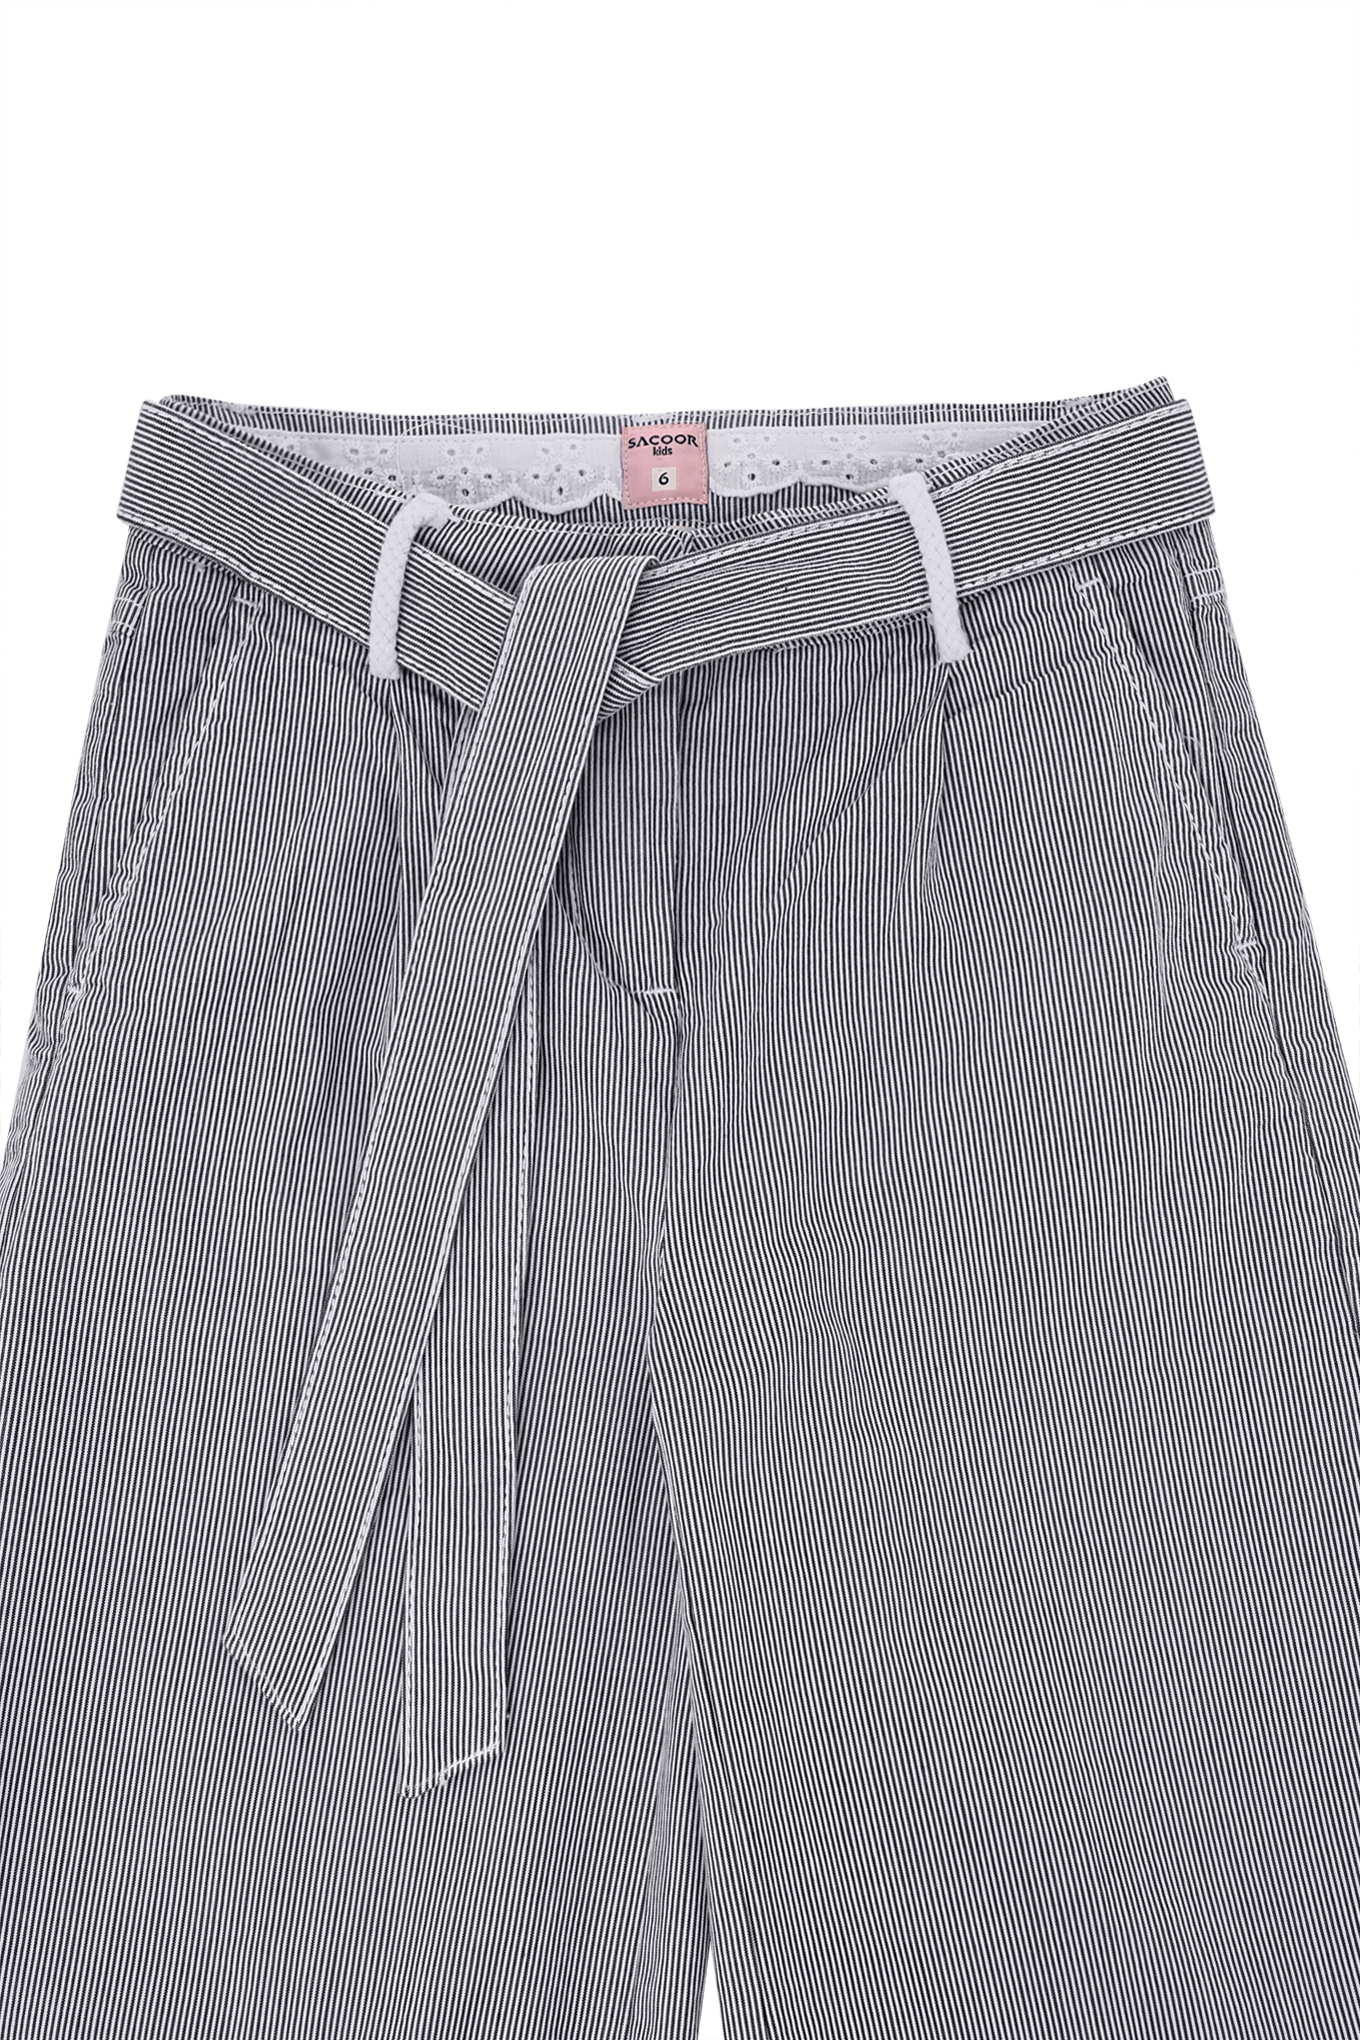 Chino Trousers Dark Blue Casual Girl